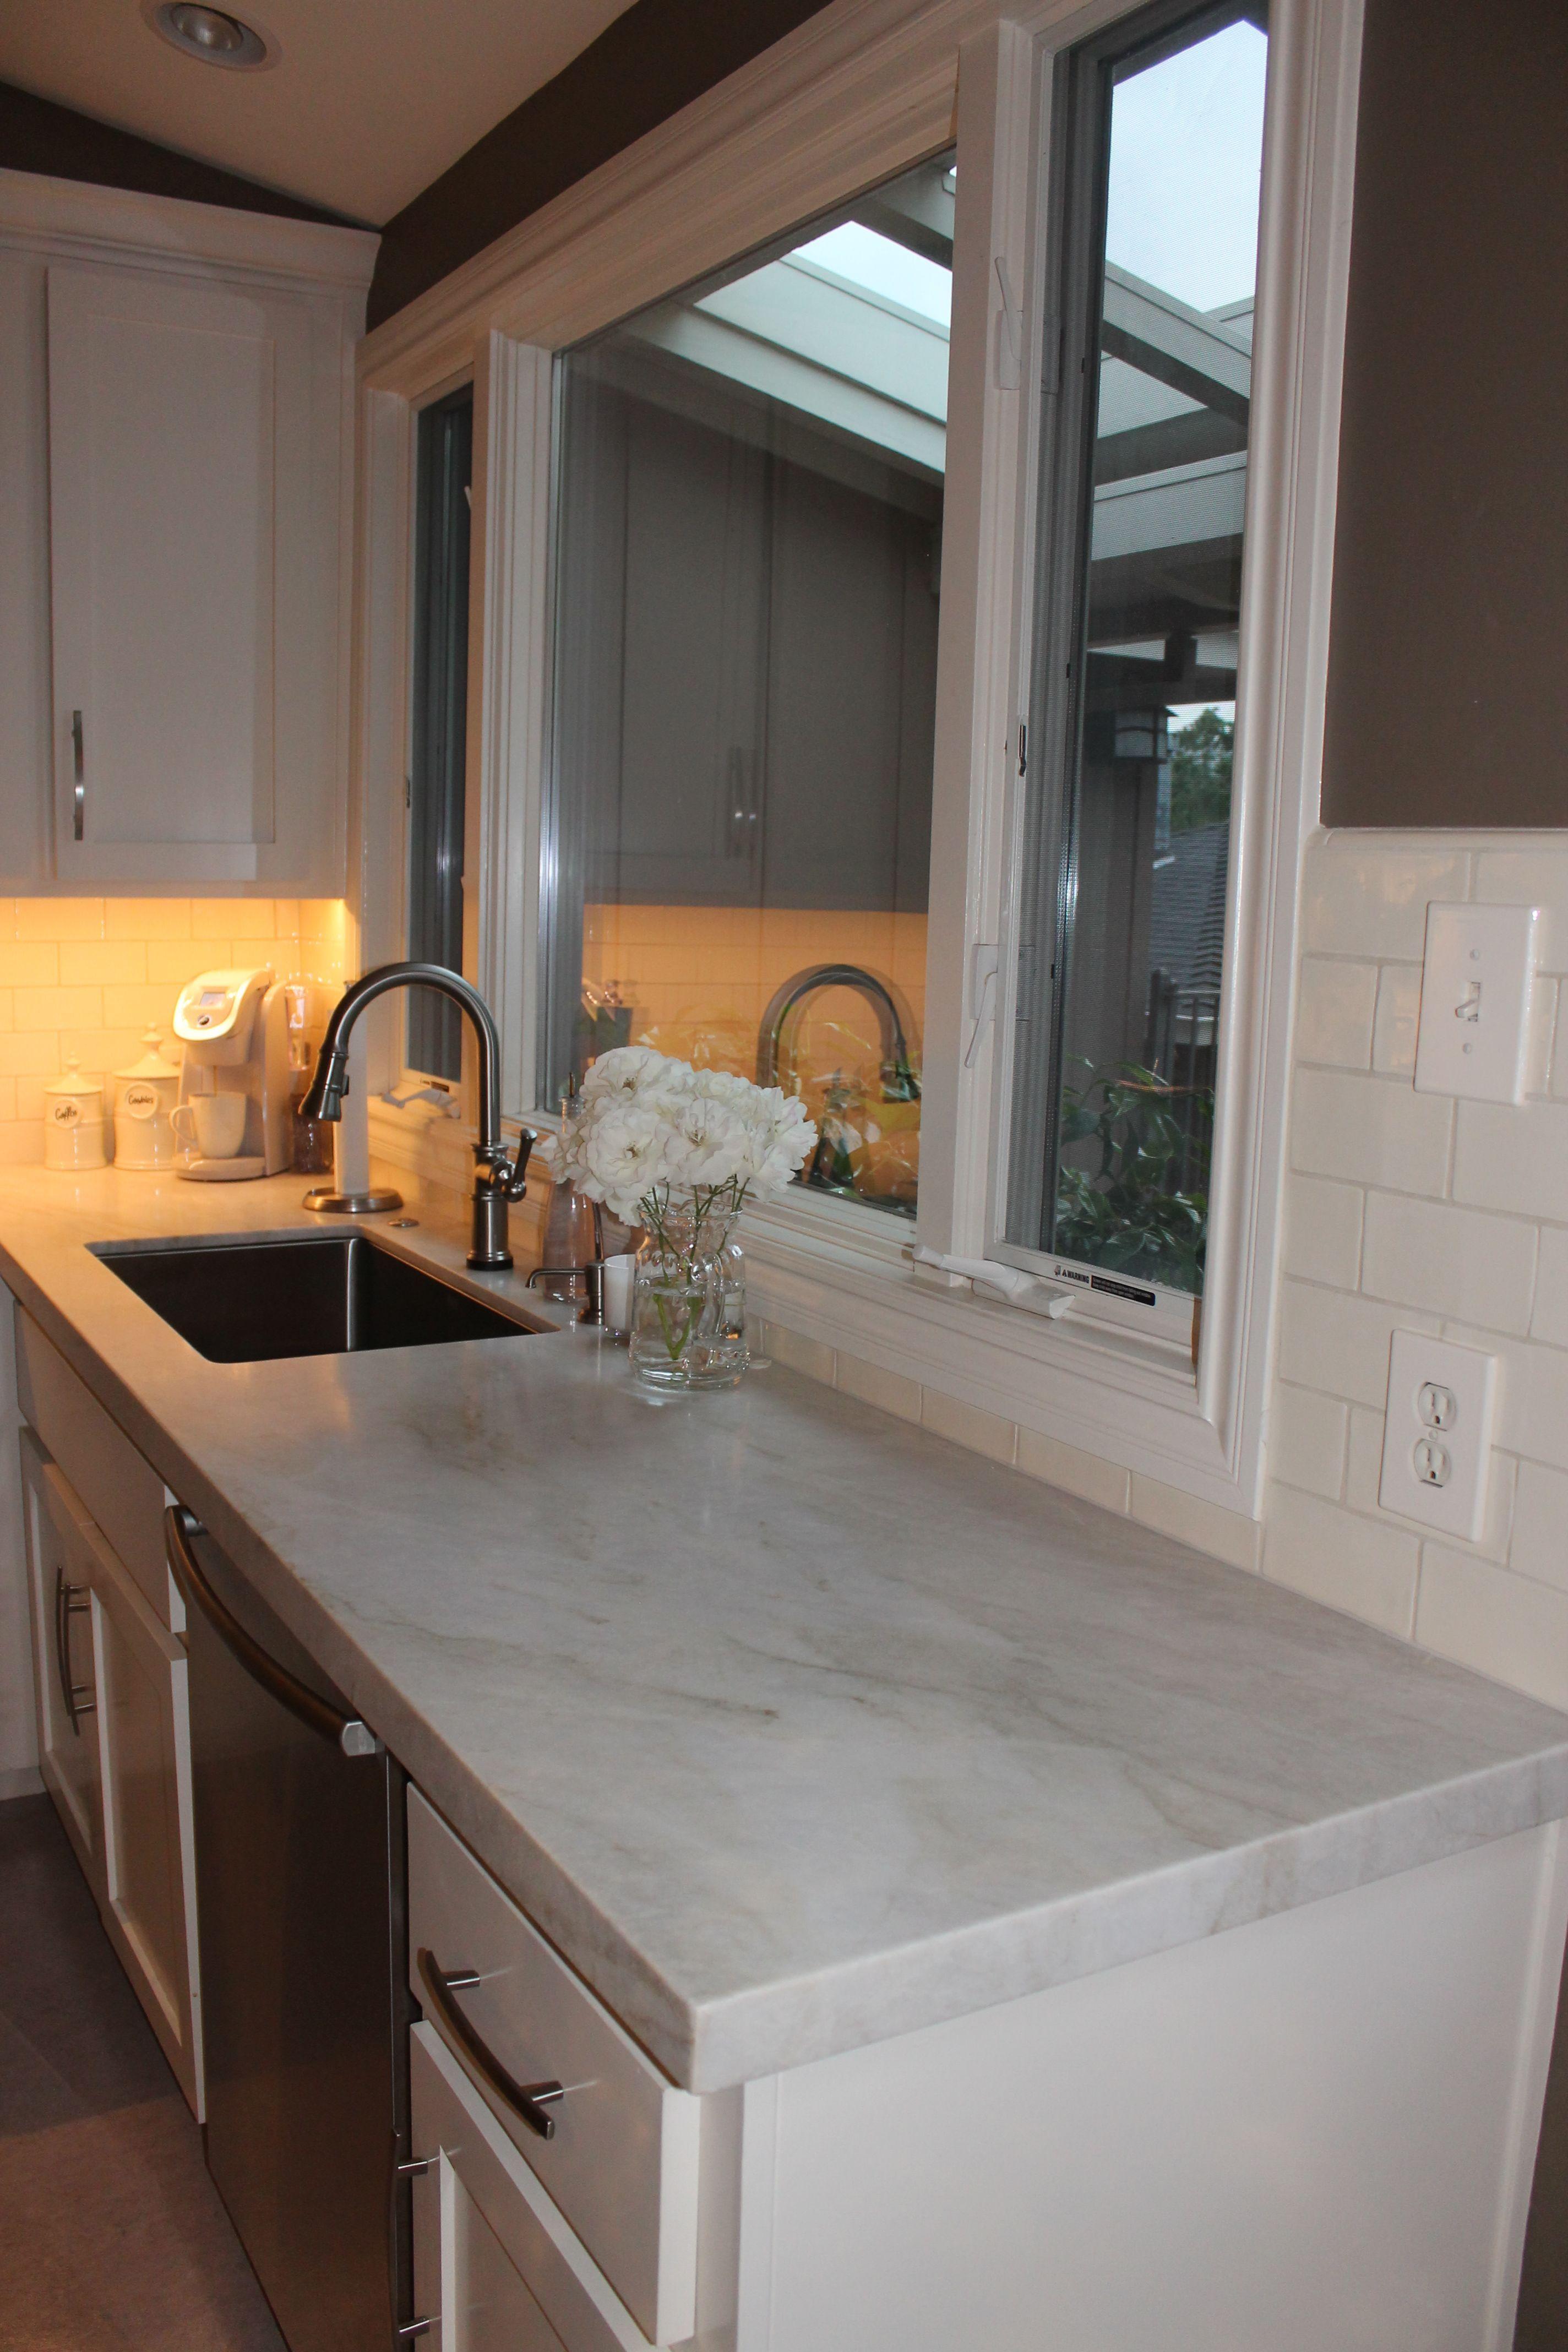 25 Honed Quartz Countertops Design Ideas | Kitchen Design ...